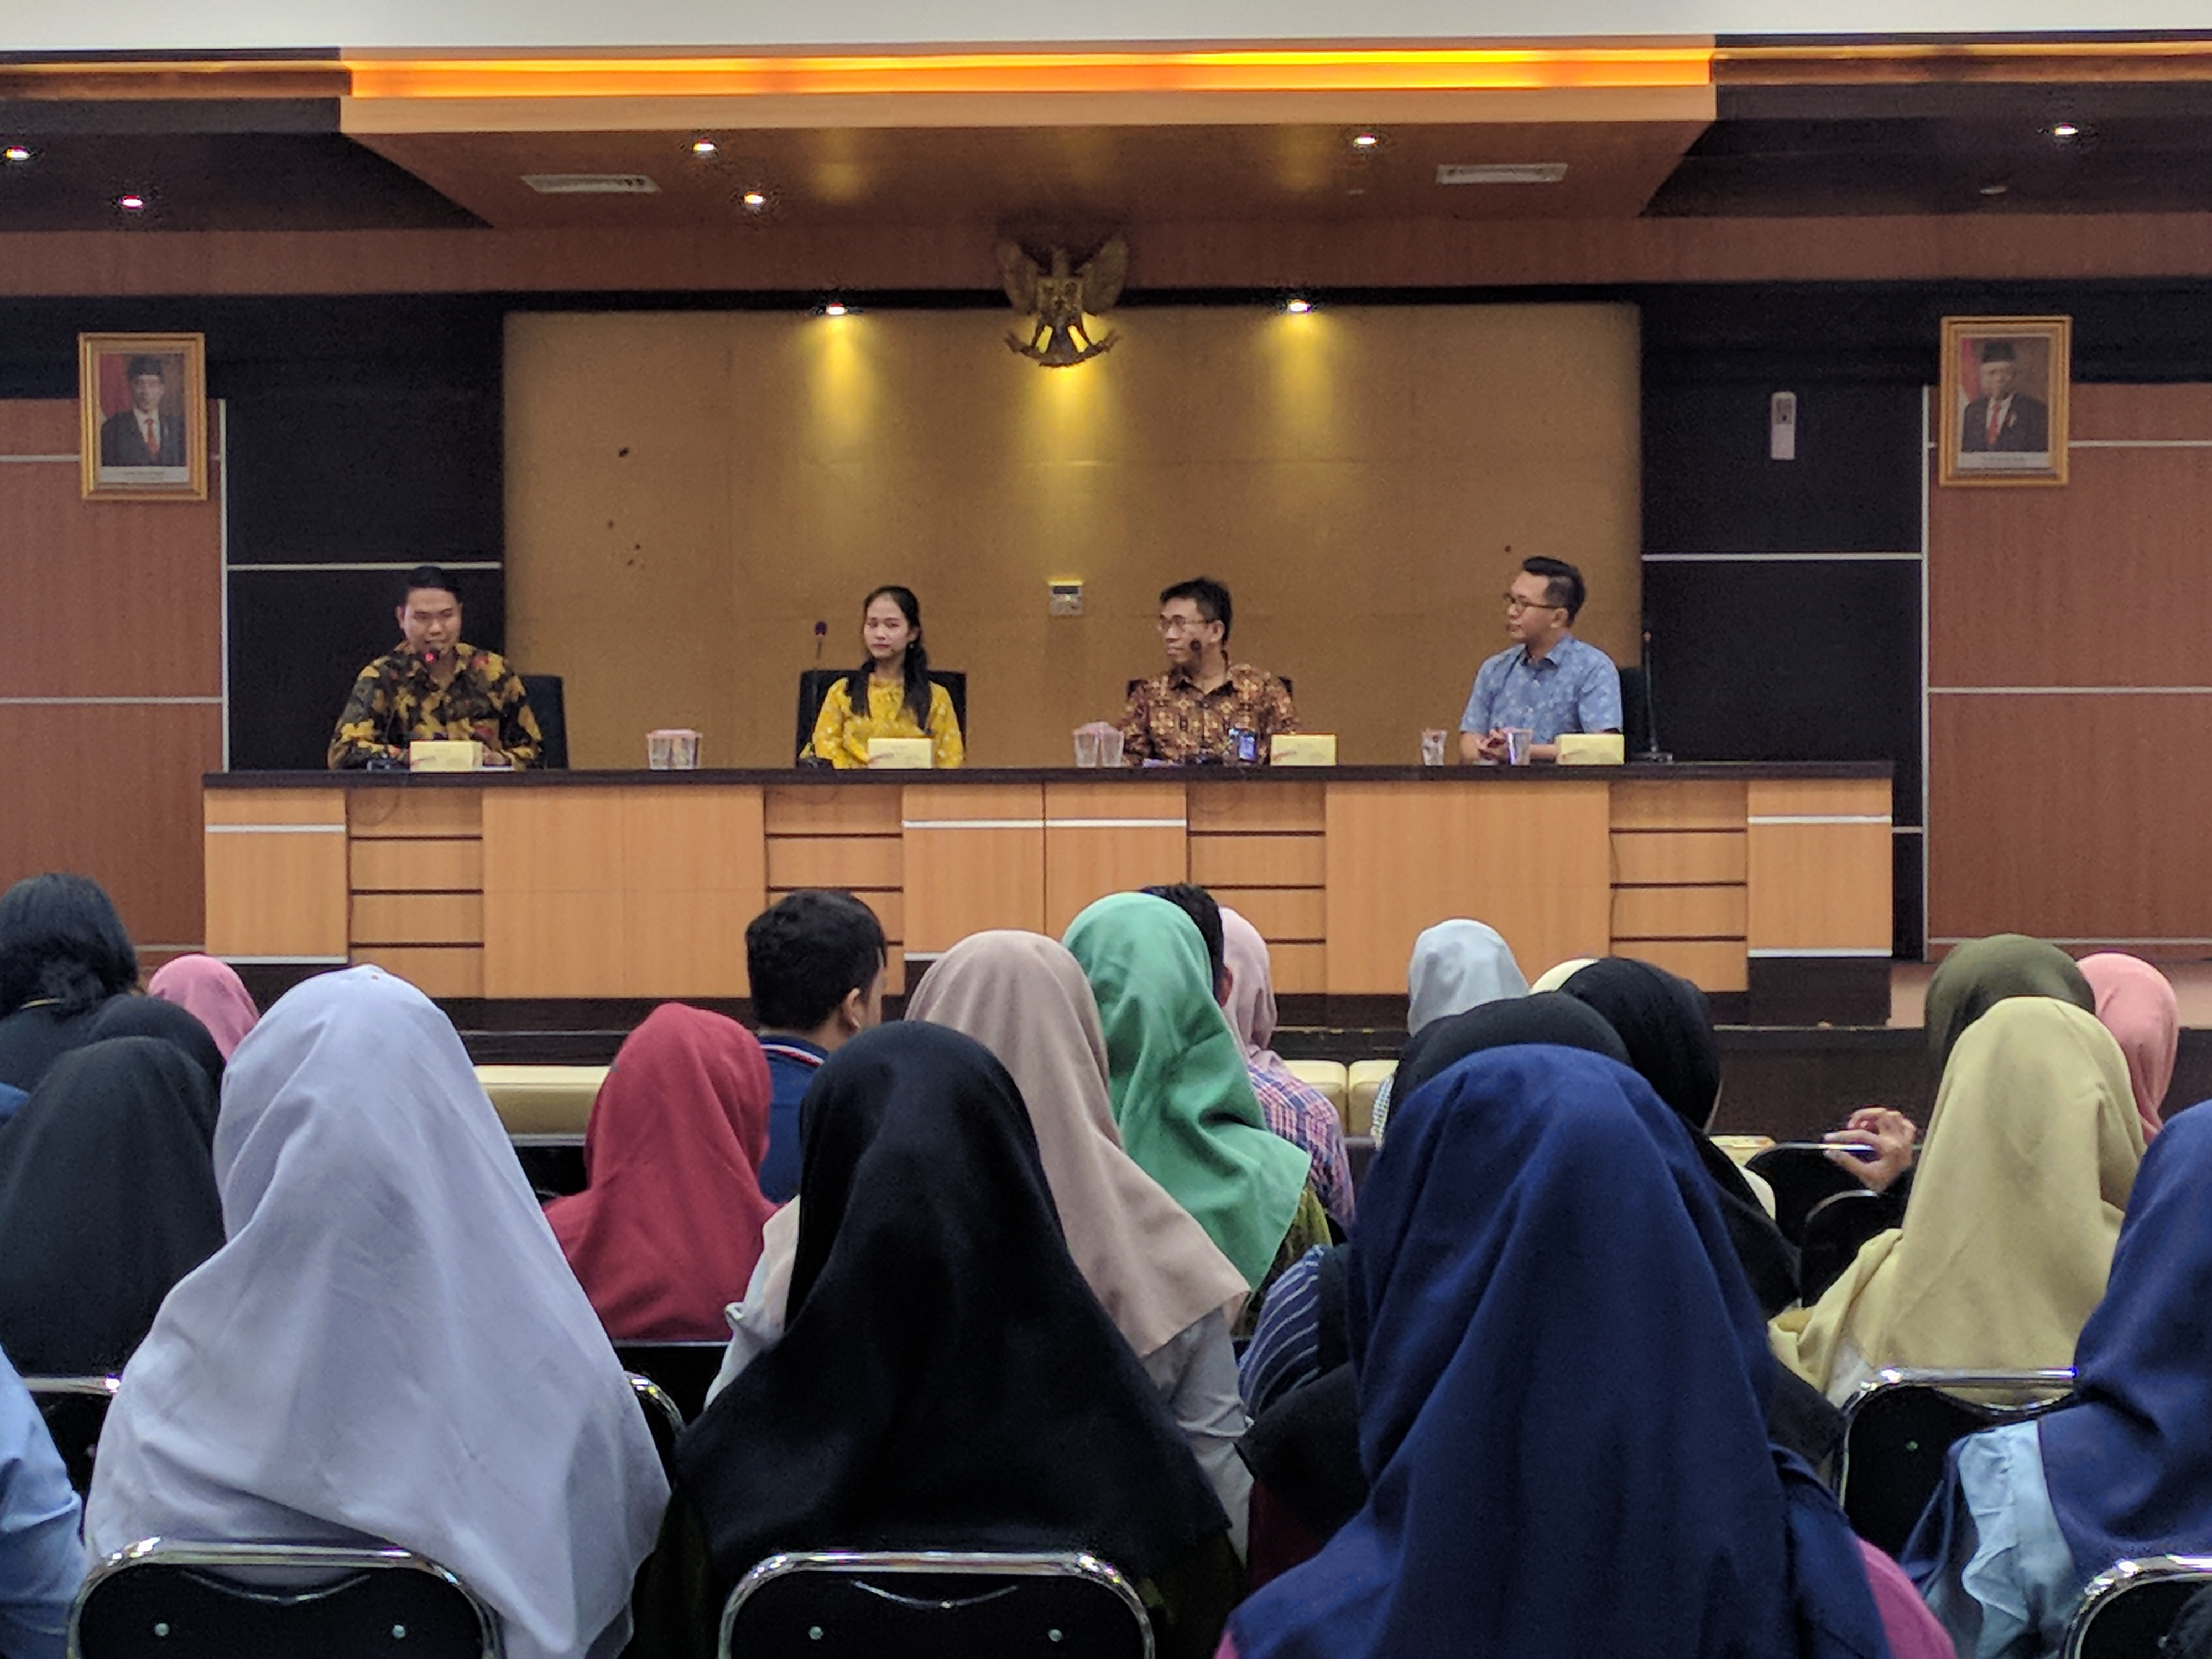 Internship Program Info Session at Universitas Negeri Surabaya